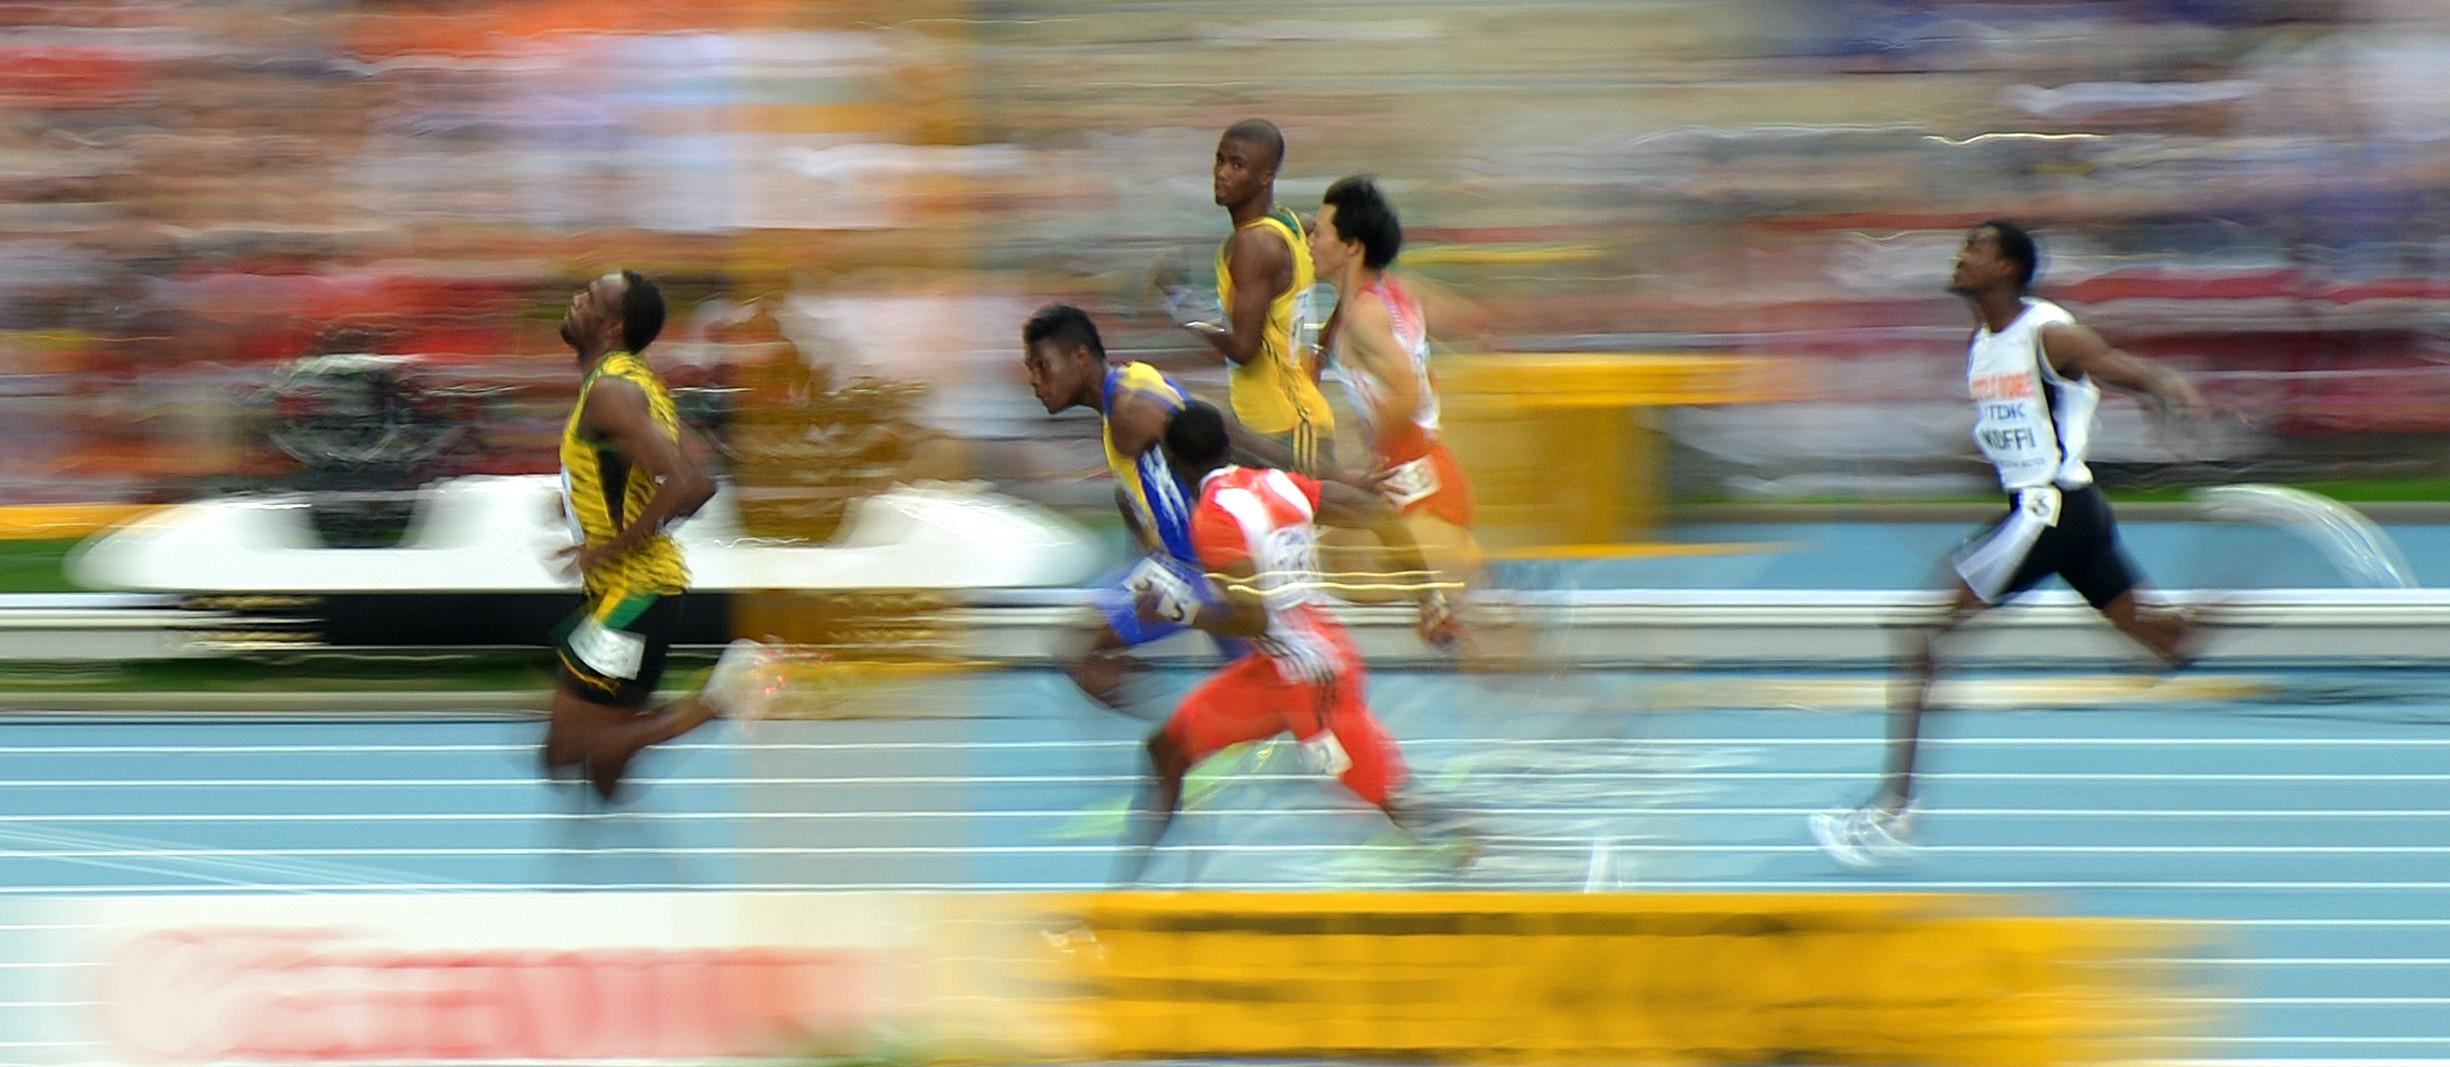 Файл:Leichtathletik WM 2013 Moskau 100 m Vorlauf.jpg